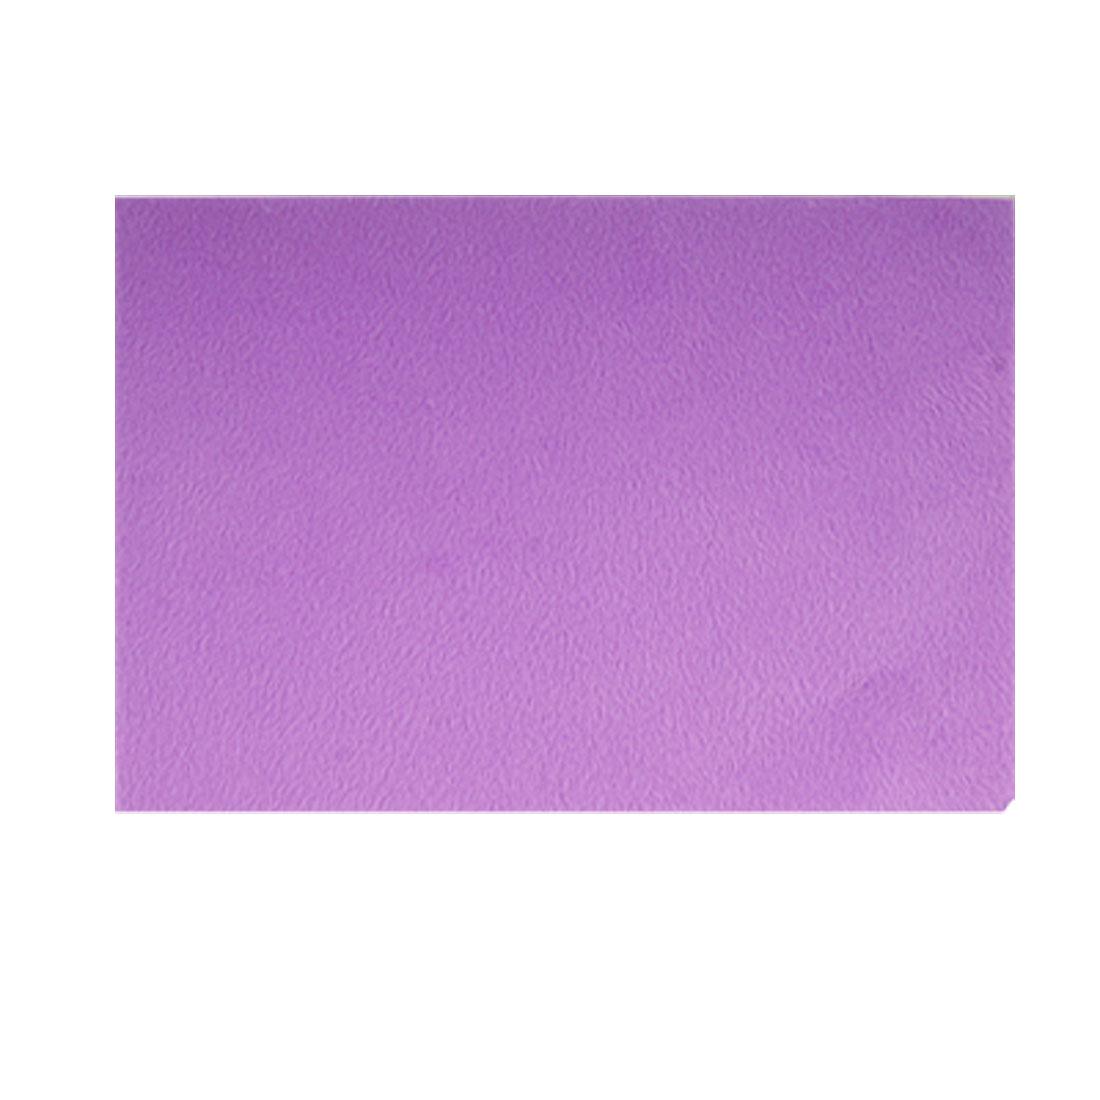 Stationery Pencil Box Solid Gum Ornament Purple Plush Fabric Sticker